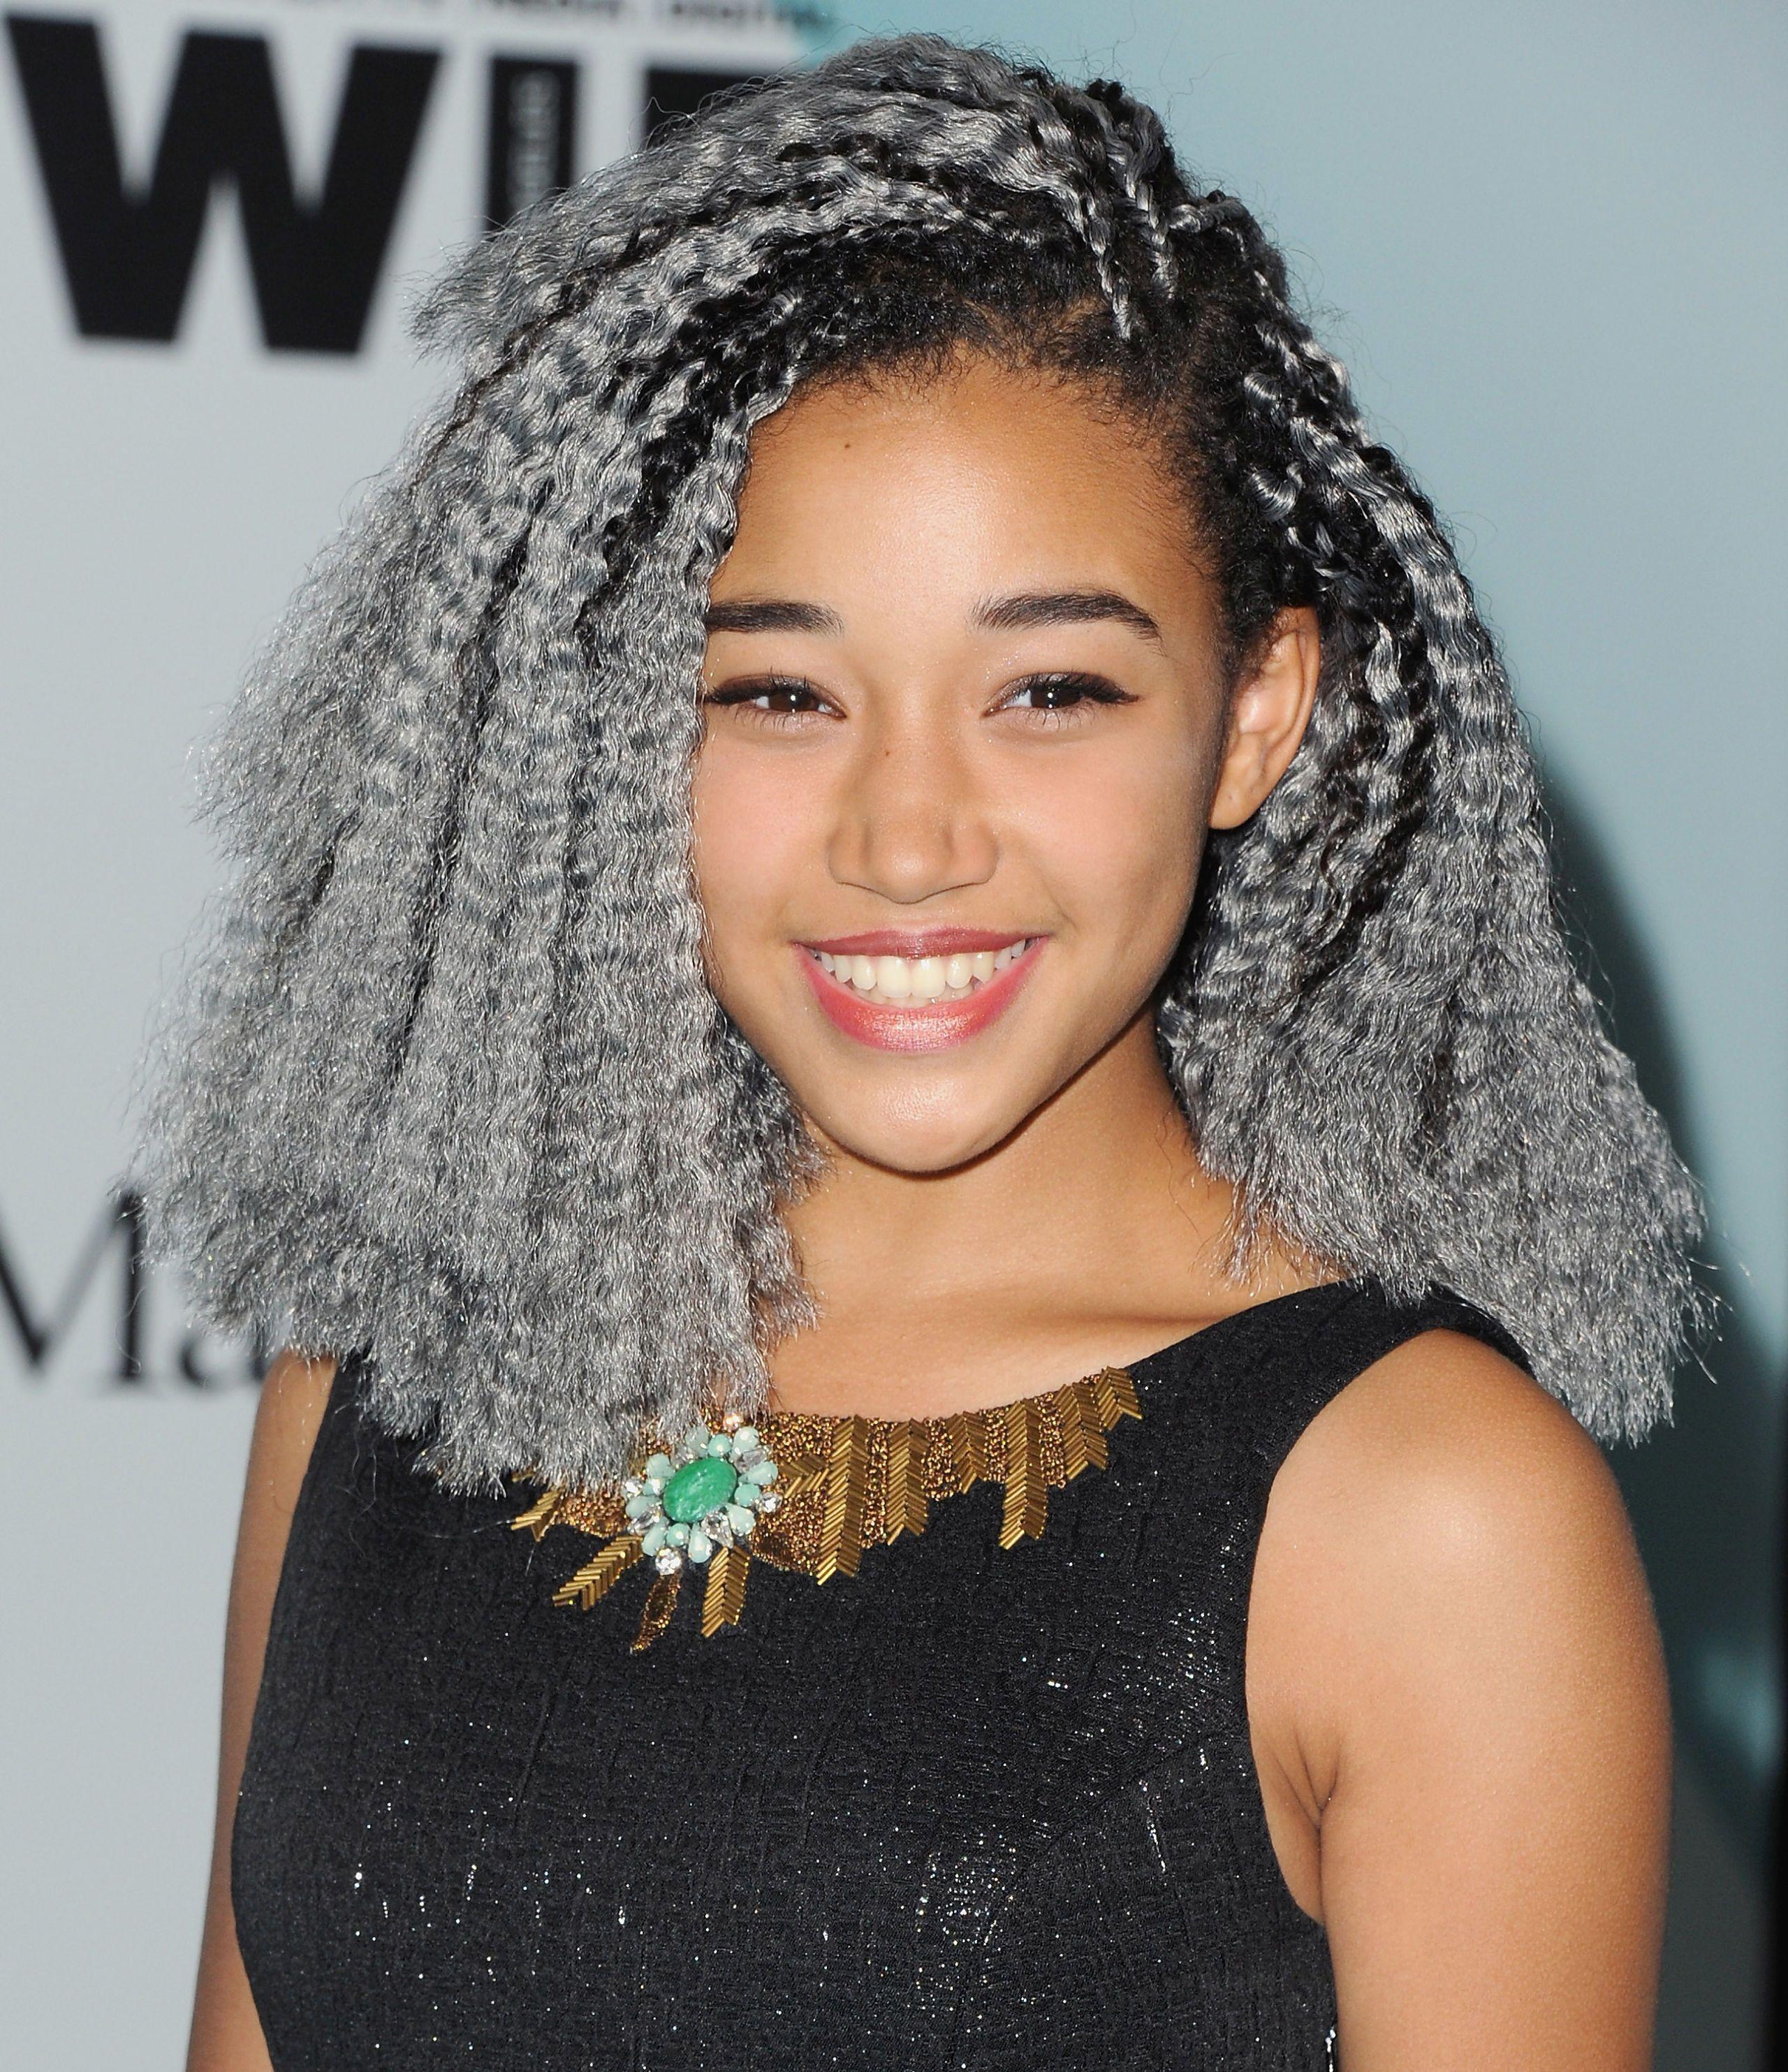 30 Easy Natural Hairstyles for Black Women , Short, Medium